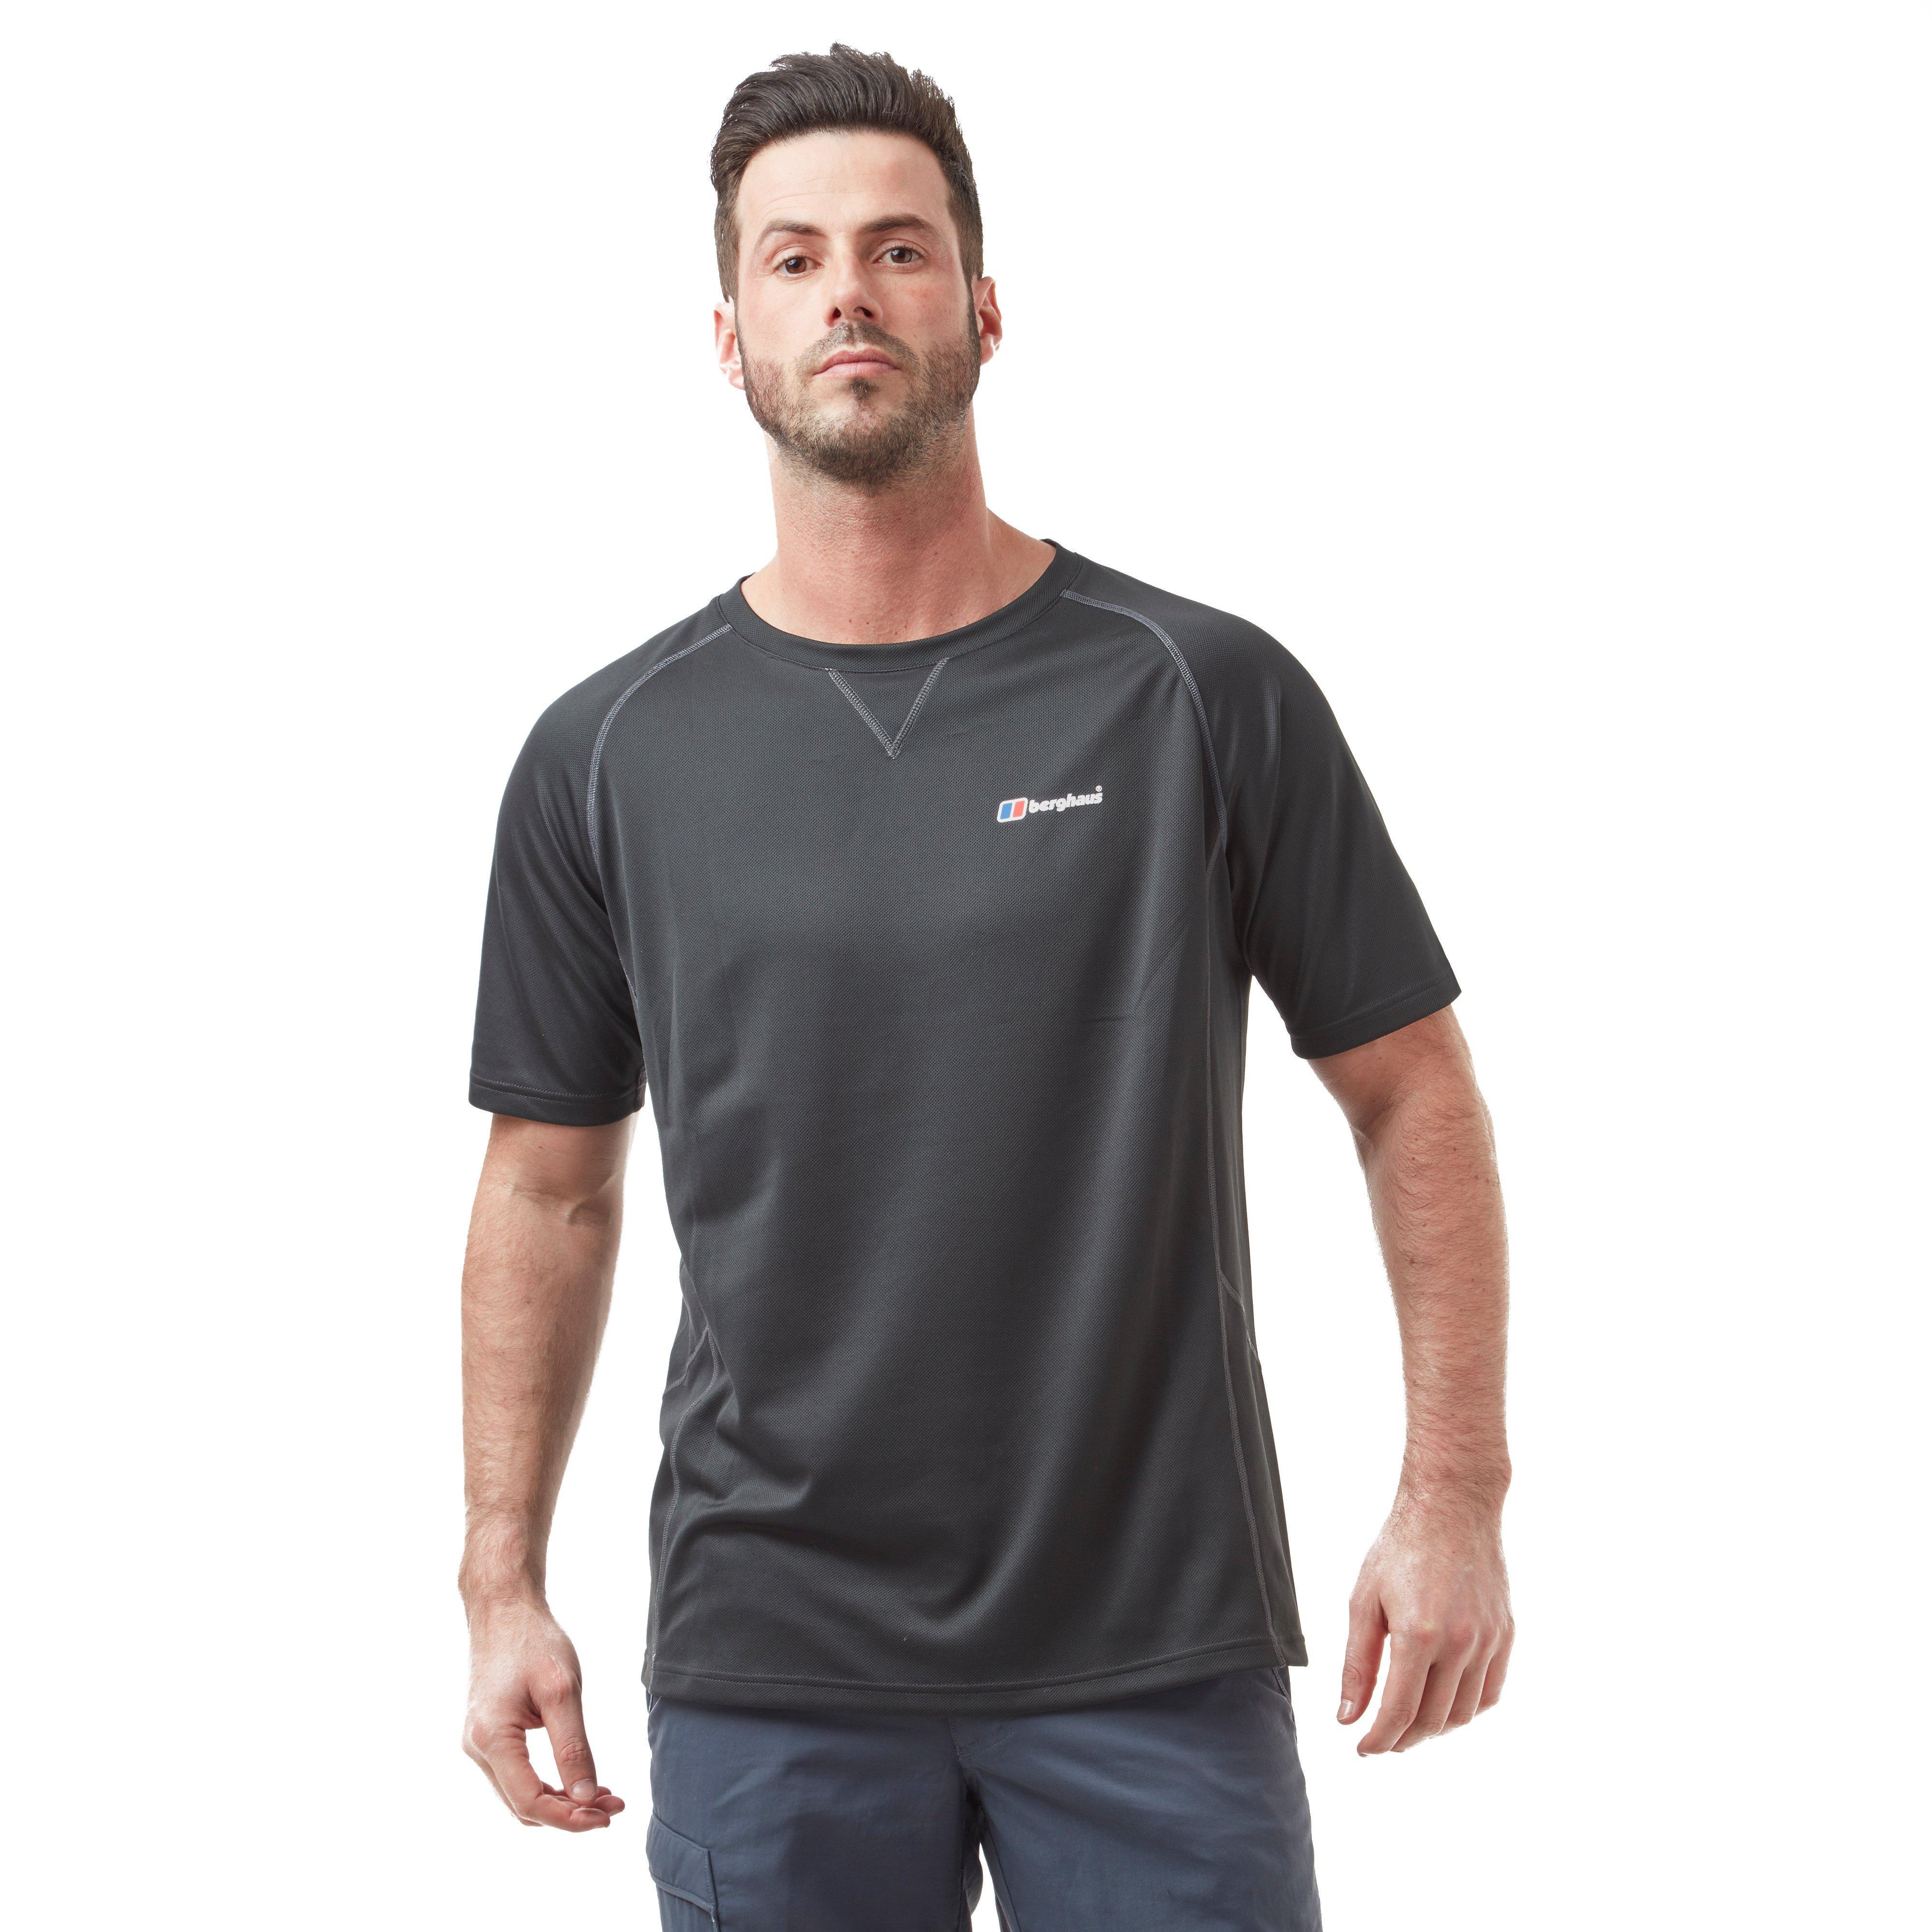 Berghaus Mens Short Sleeve Crew 2.0 T-shirt - Black  Black